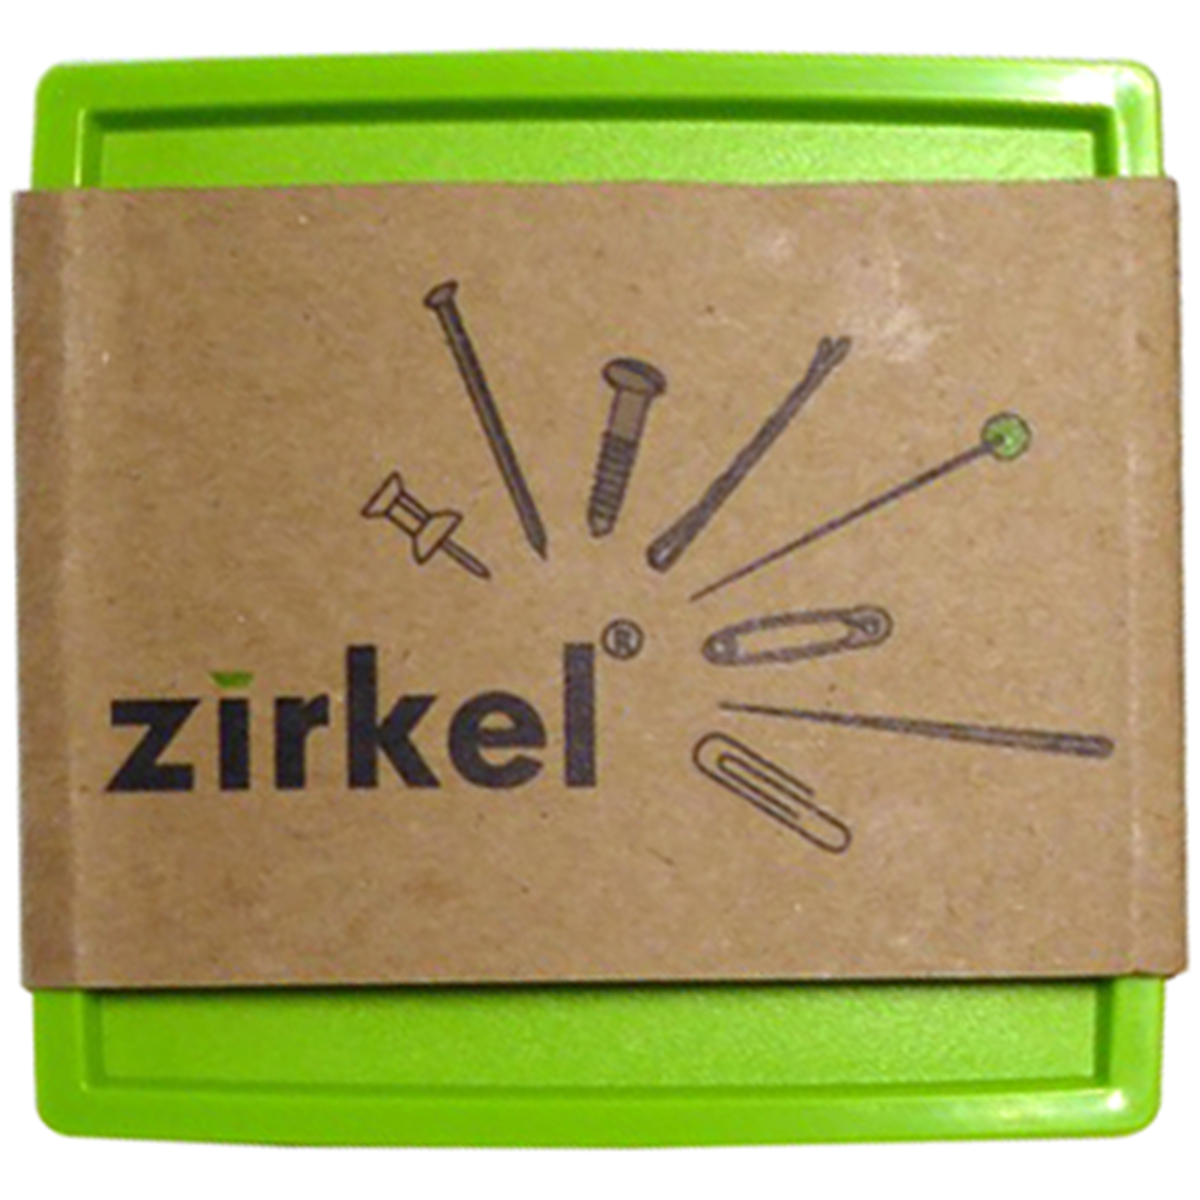 Zirkel Magnetic Organizer-Lime